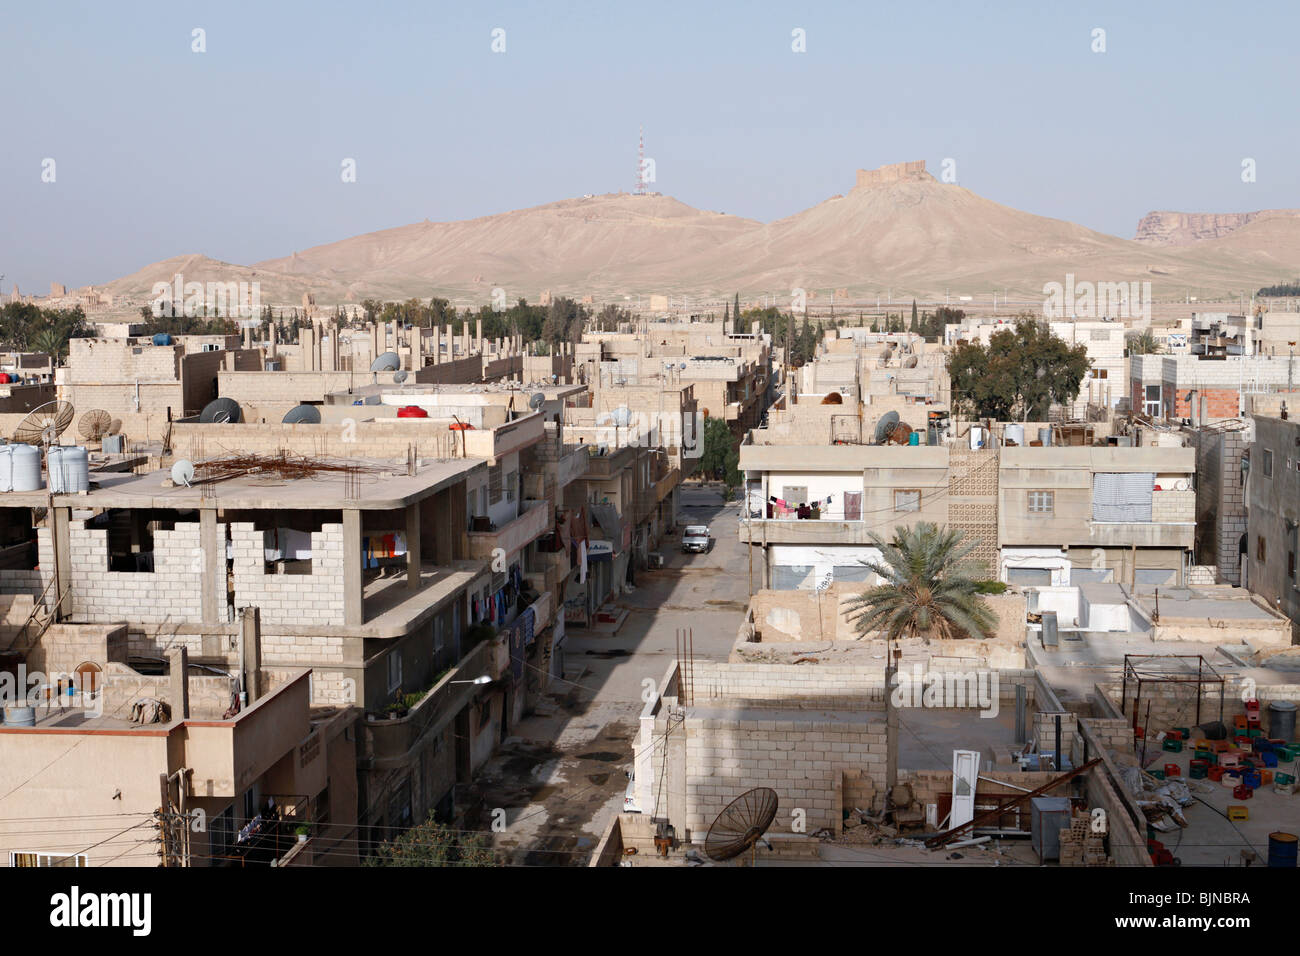 City of Tadmur near  Palmyra in Syria. On the hill top is Fakhreddin Almaani castle. - Stock Image